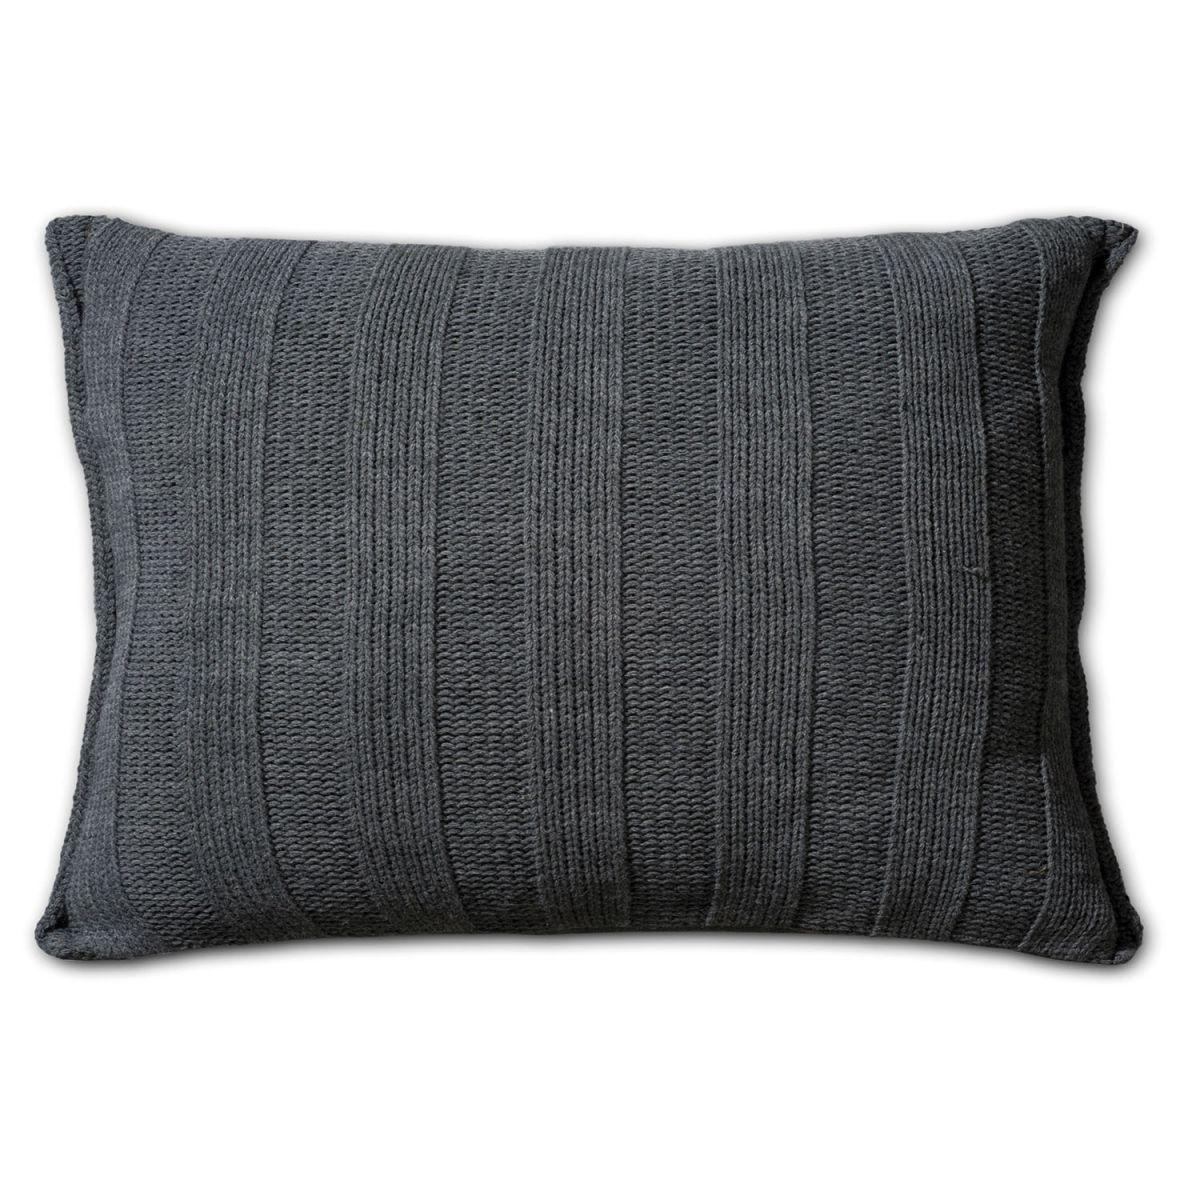 6x6 rib cushion anthracite 60x40